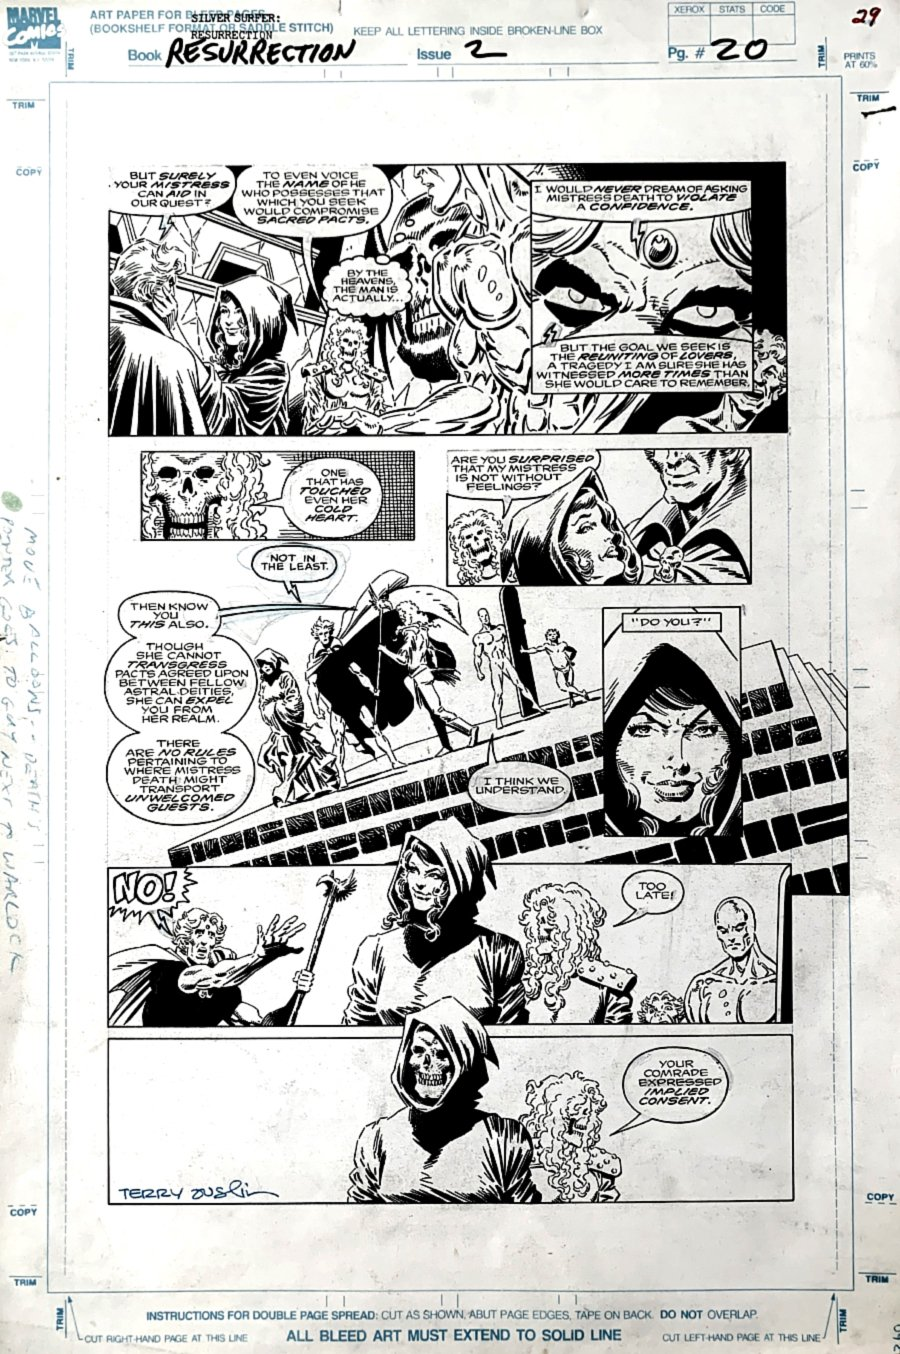 Silver Surfer / Warlock: Resurrection #2 p 20 (Adam Warlock, Silver Surfer, Death, Pip) LARGE ART - 1992